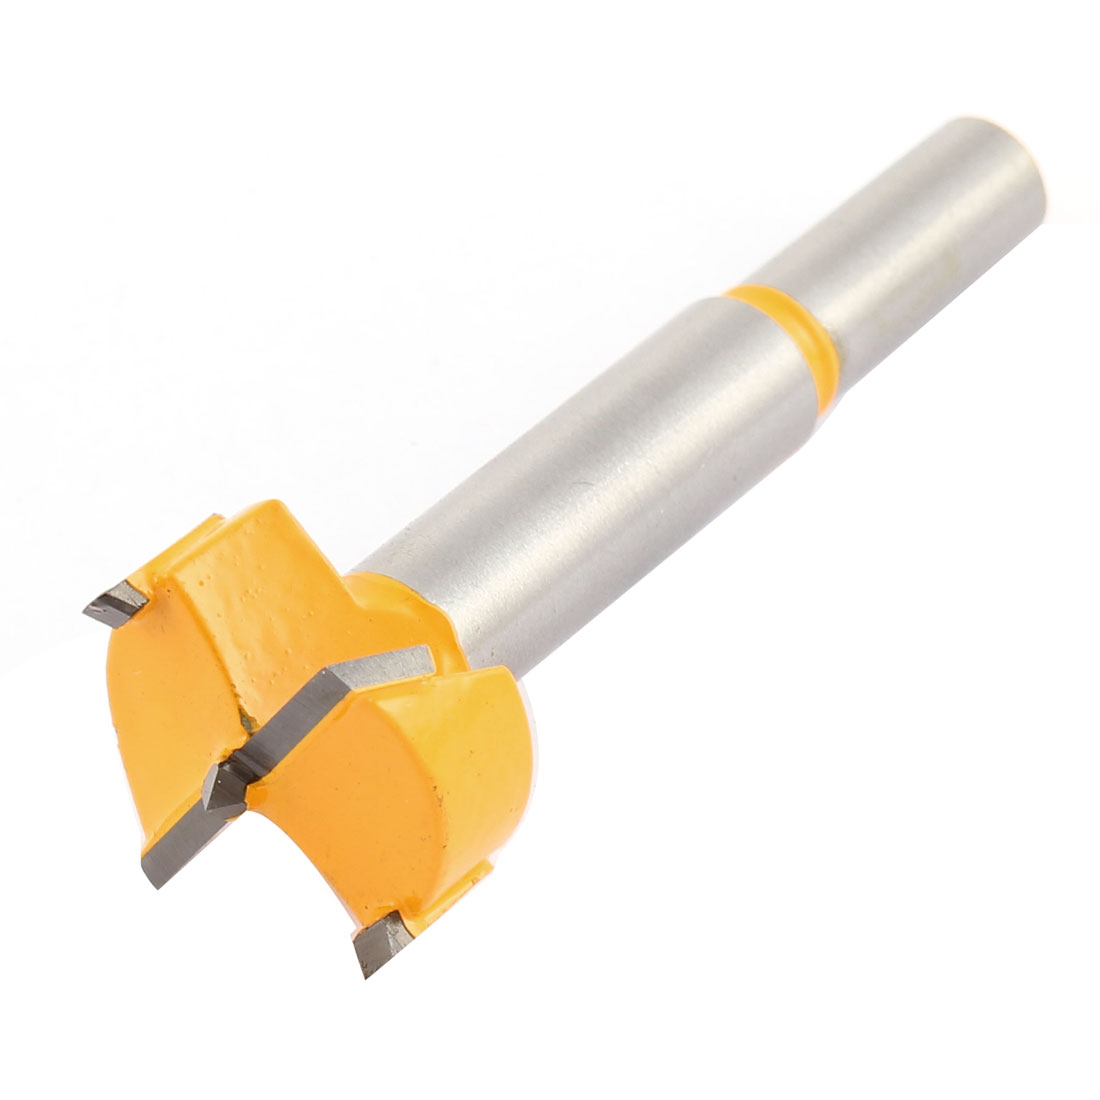 Woodworking Wood Cutting 28mm Diameter Hole Saw Drill Bit Cutter Set